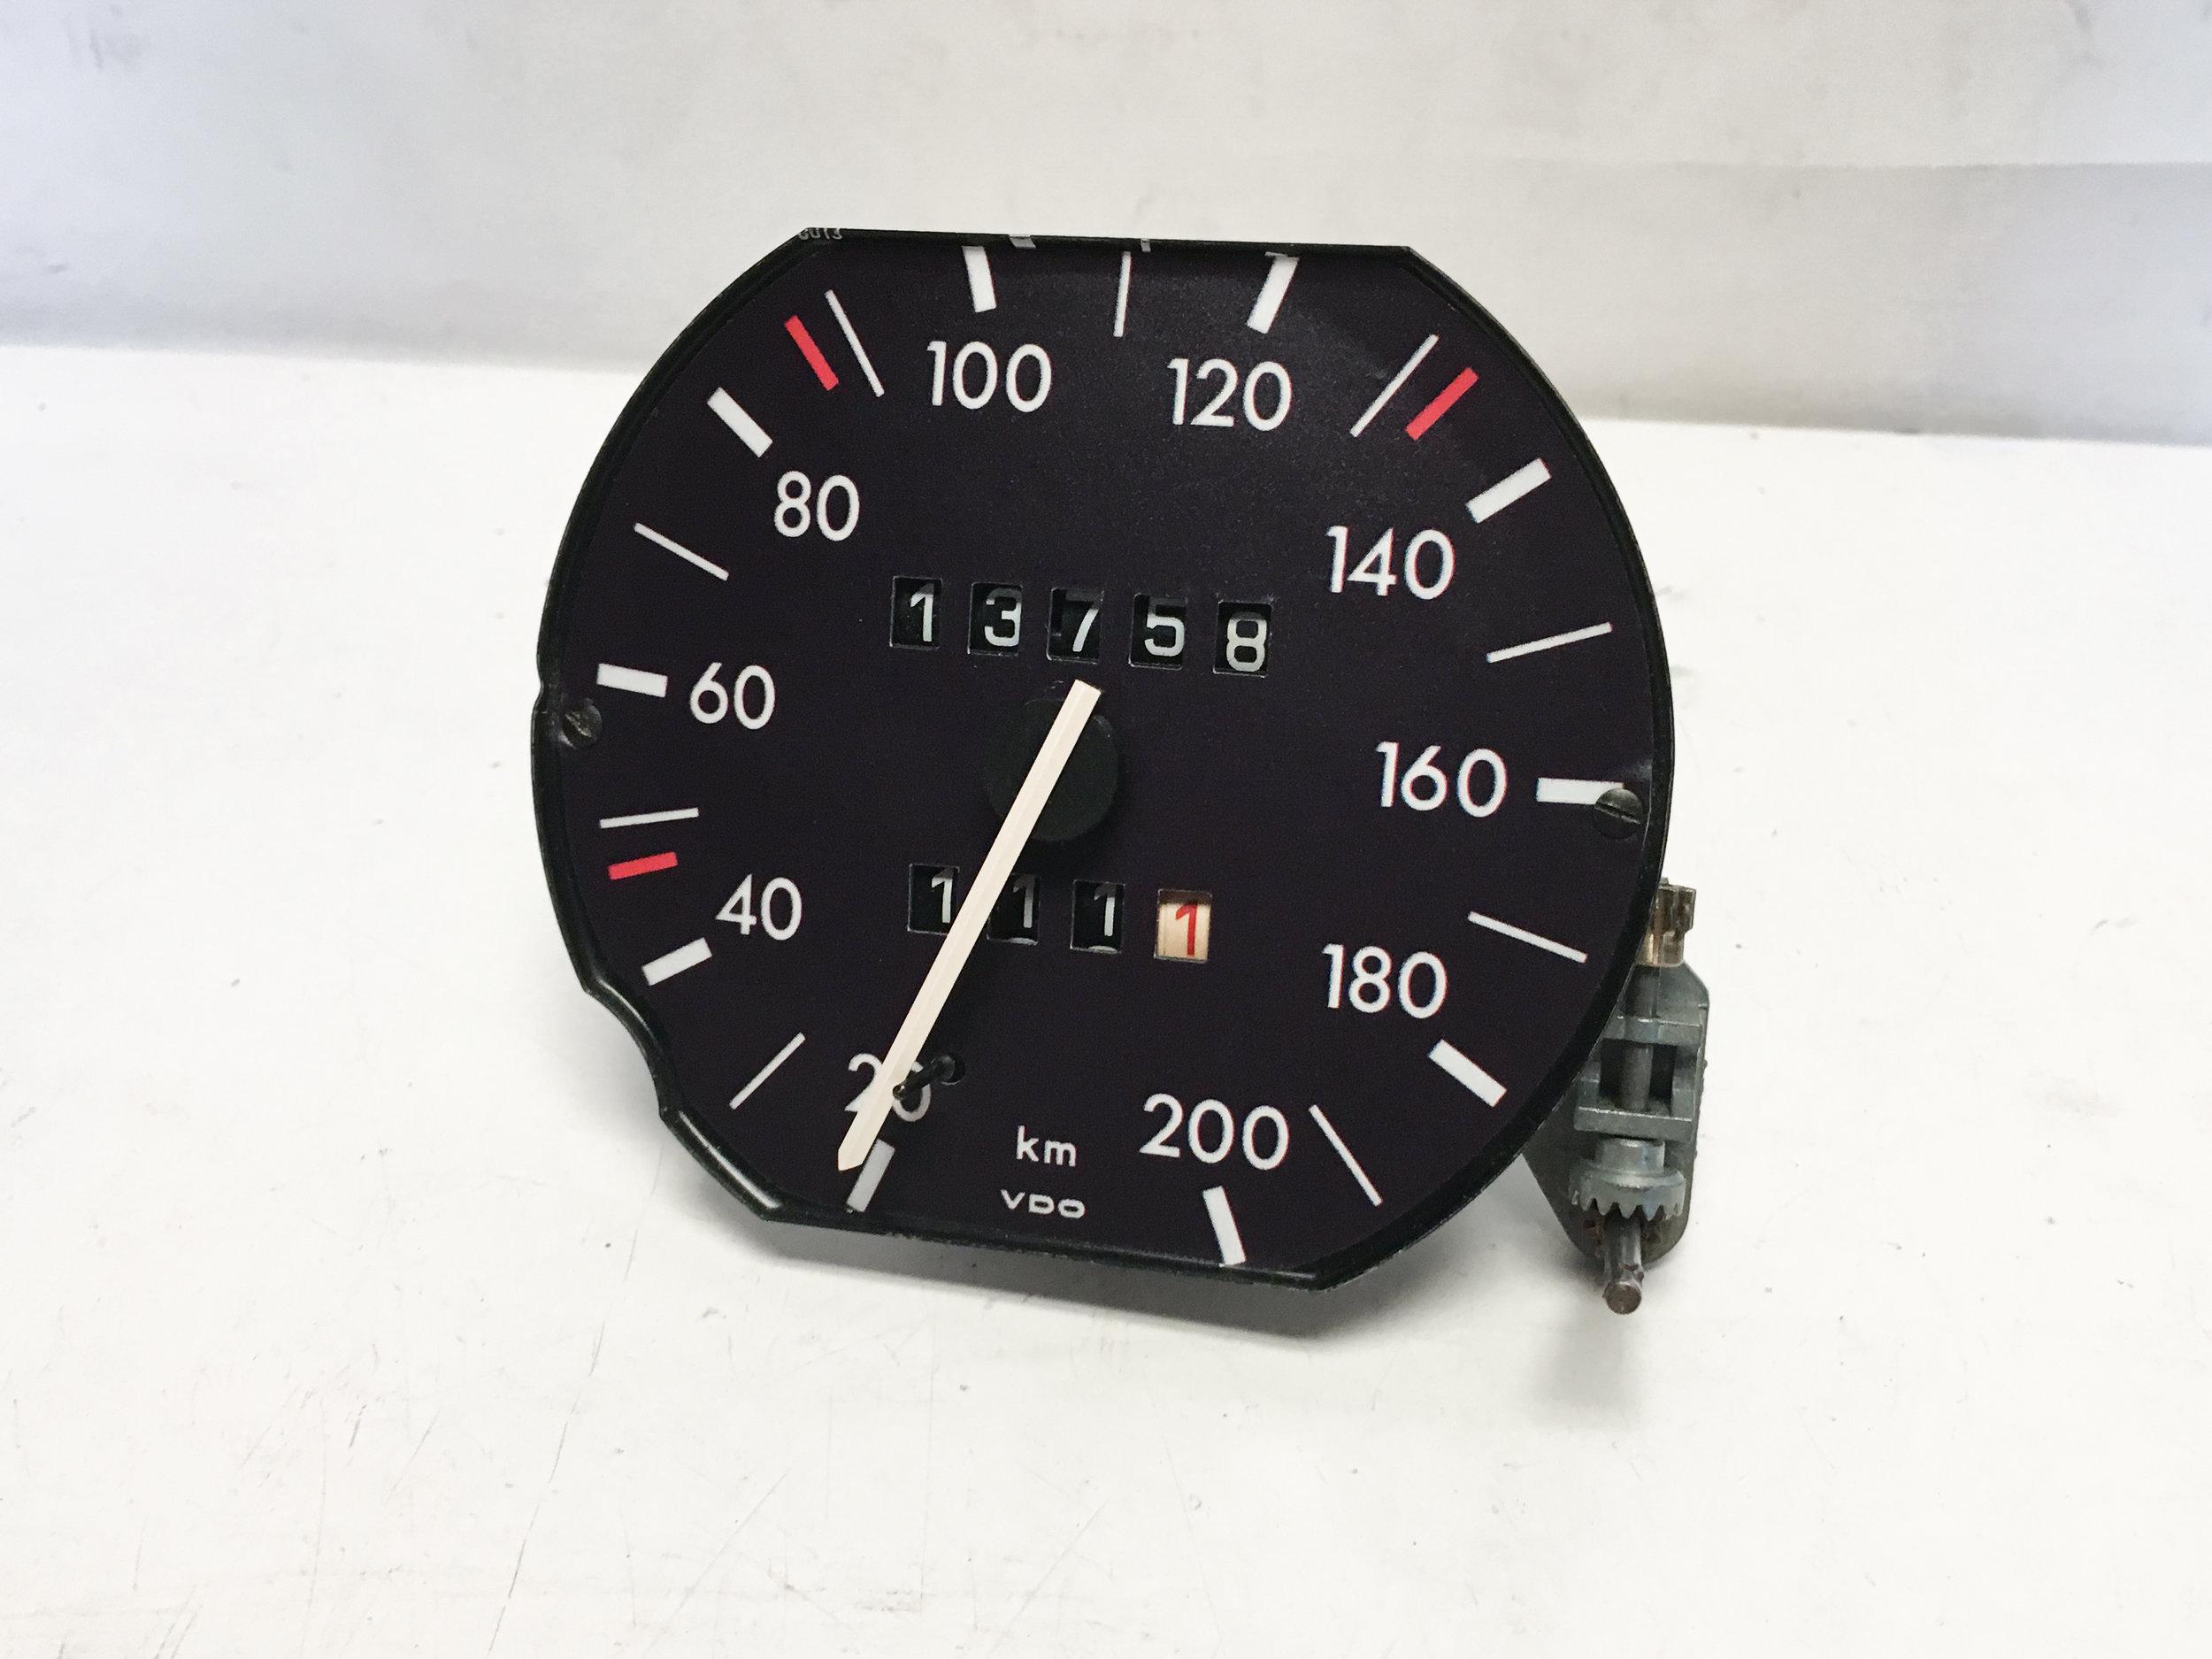 Euro Spec Speedometer Overlay.jpg